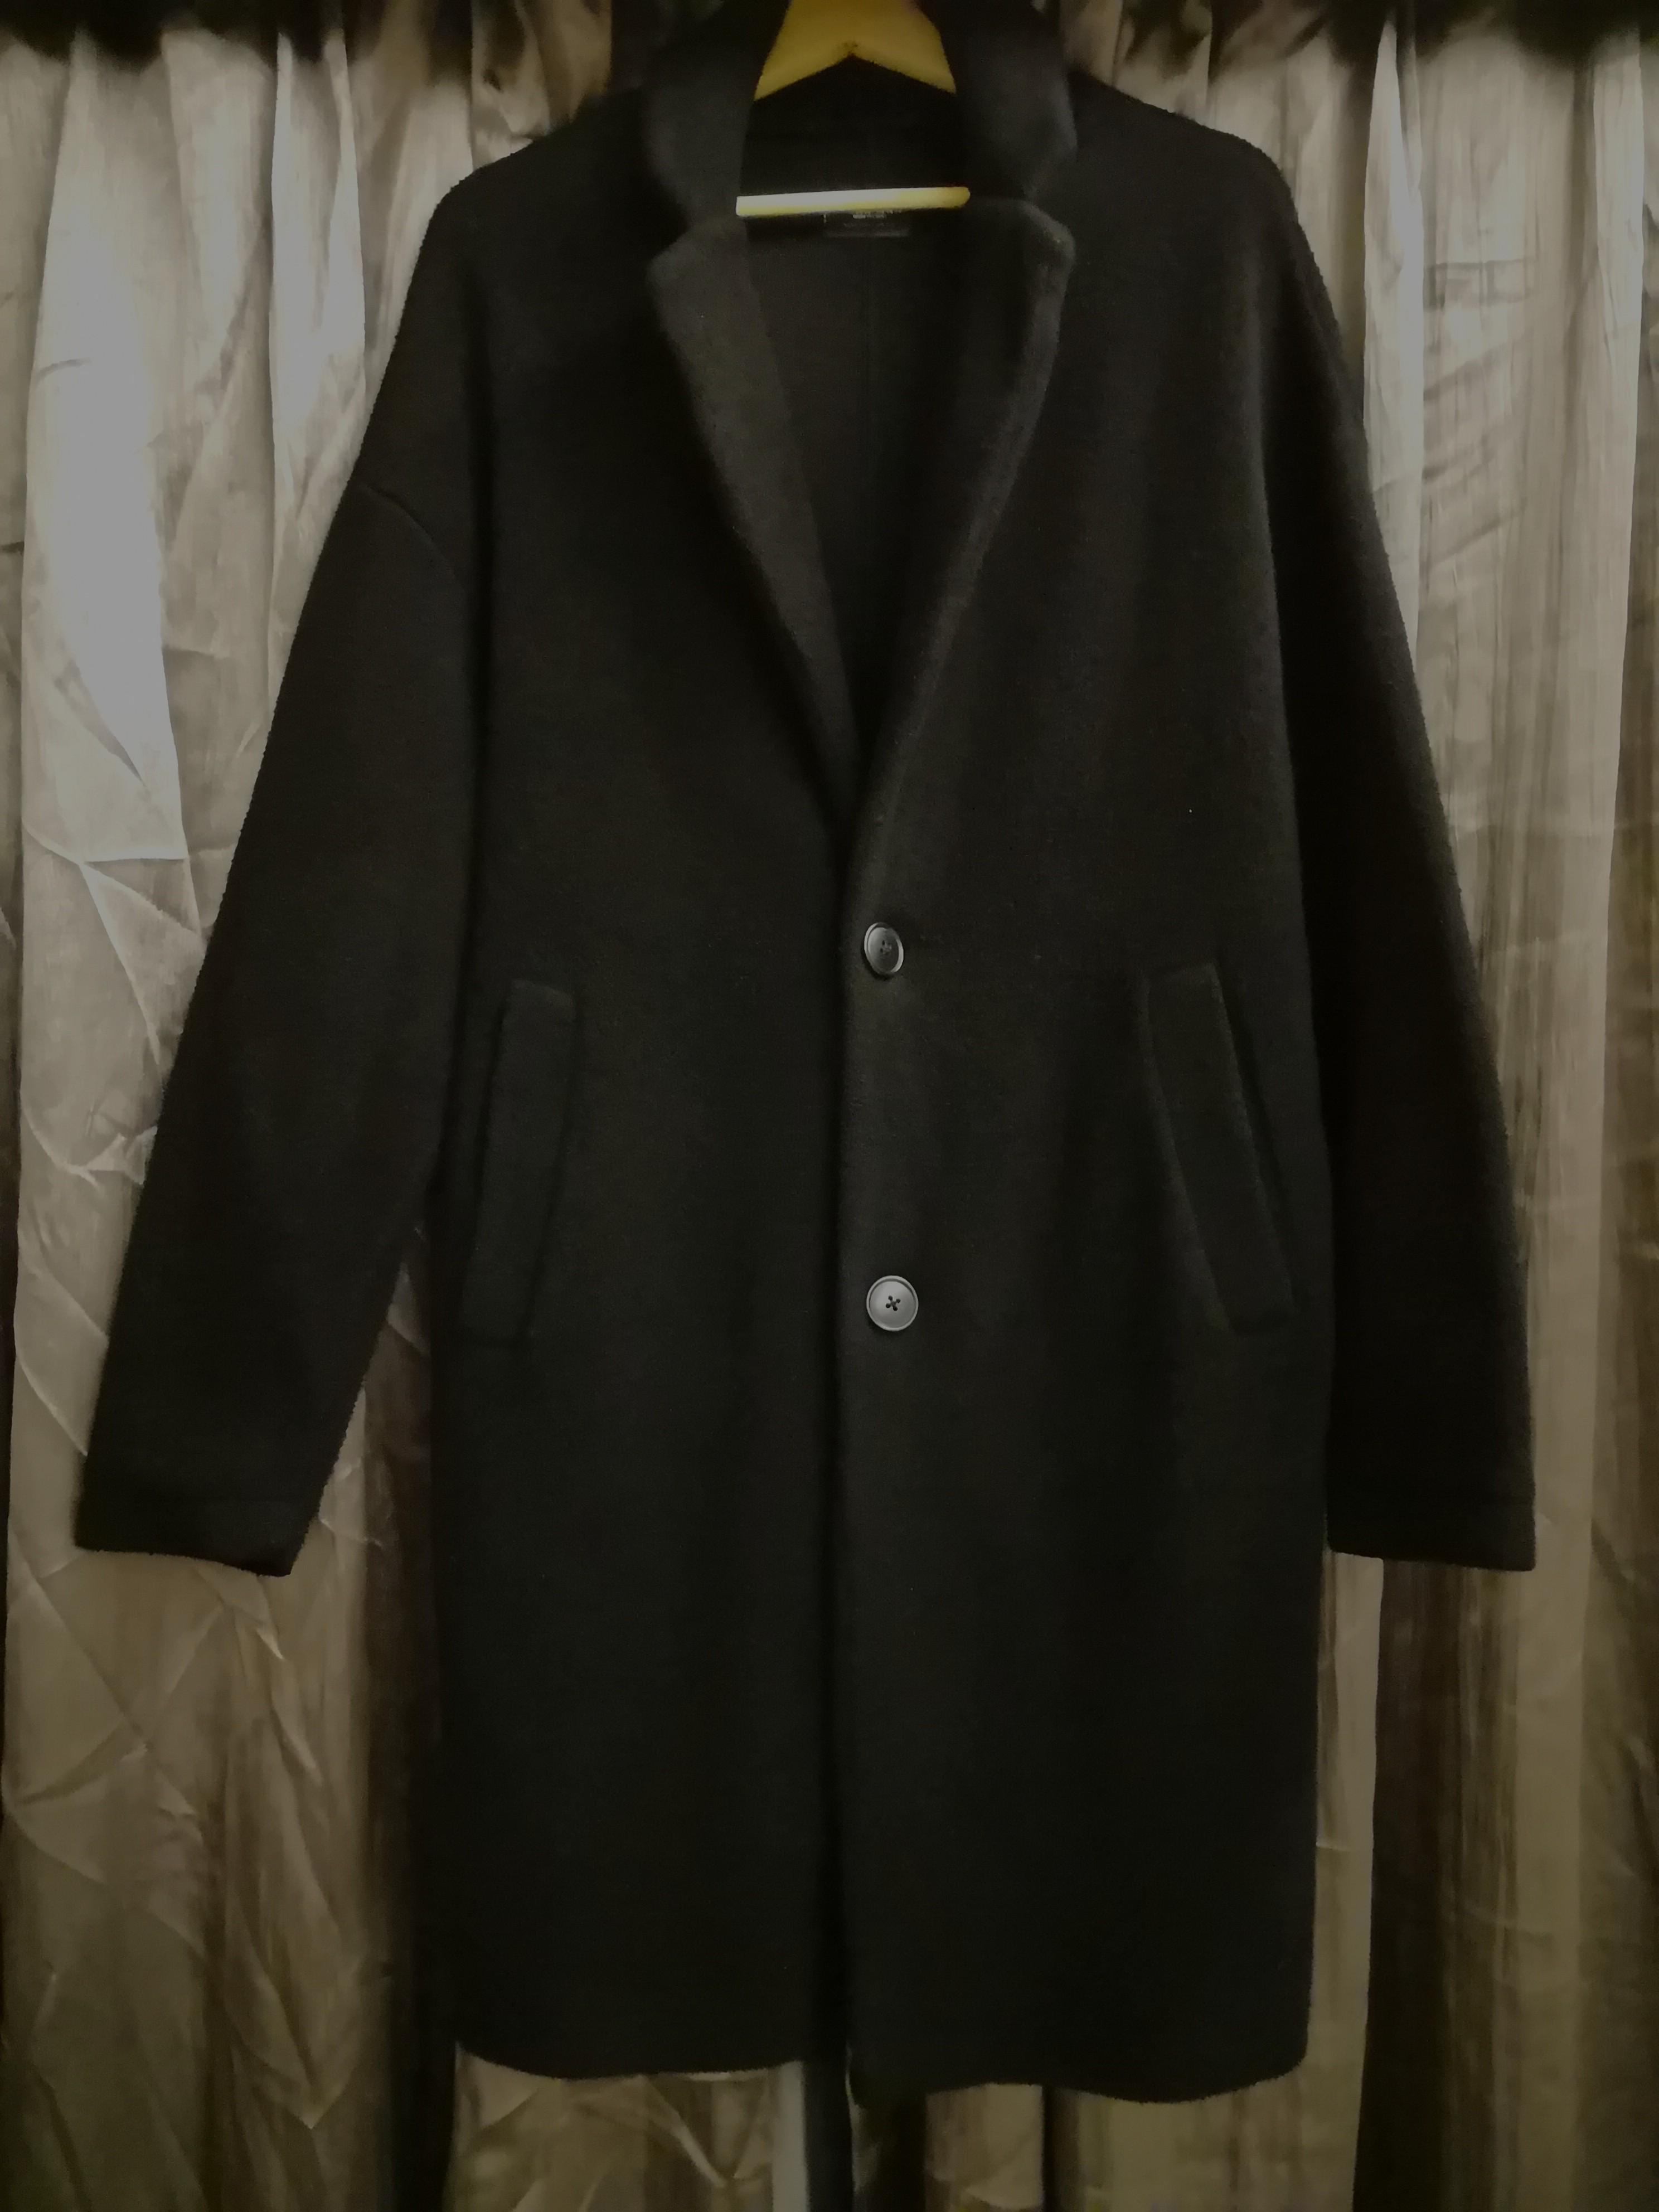 4e09aa21 Zara Mens Long Coat, Men's Fashion, Clothes, Outerwear on Carousell